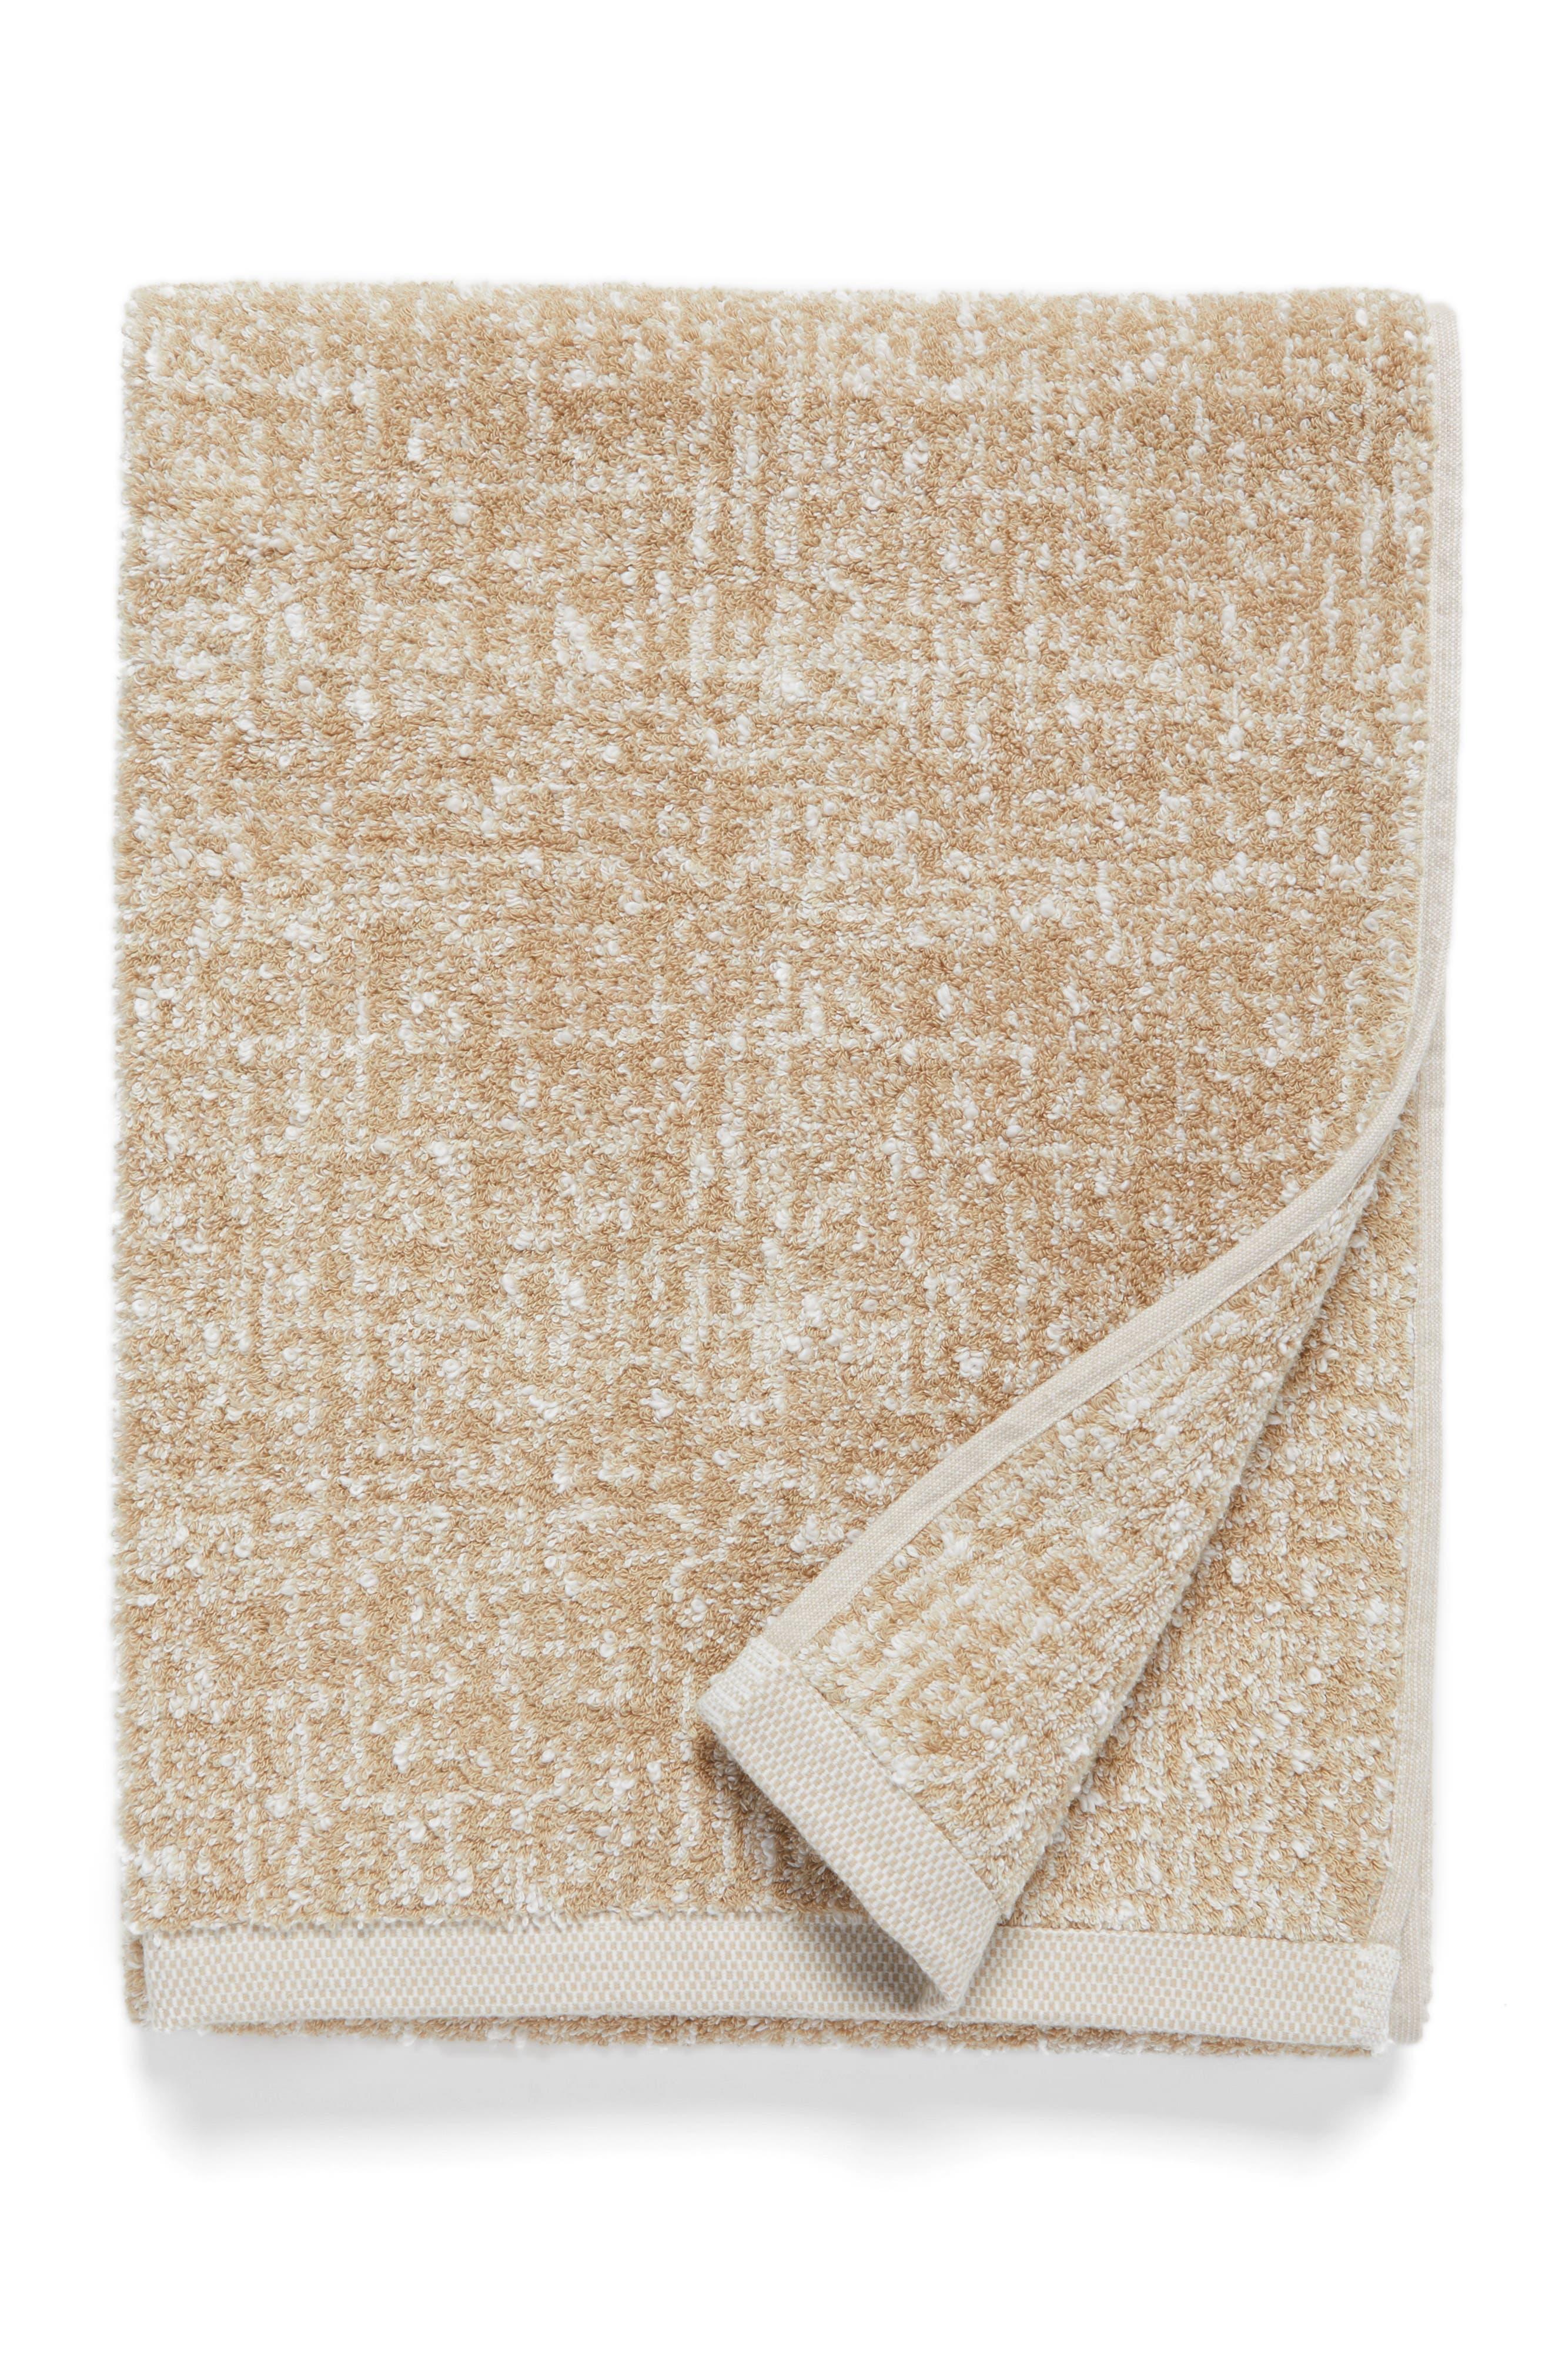 Main Image - Nordstrom at Home Tweed Jacquard Bath Towel